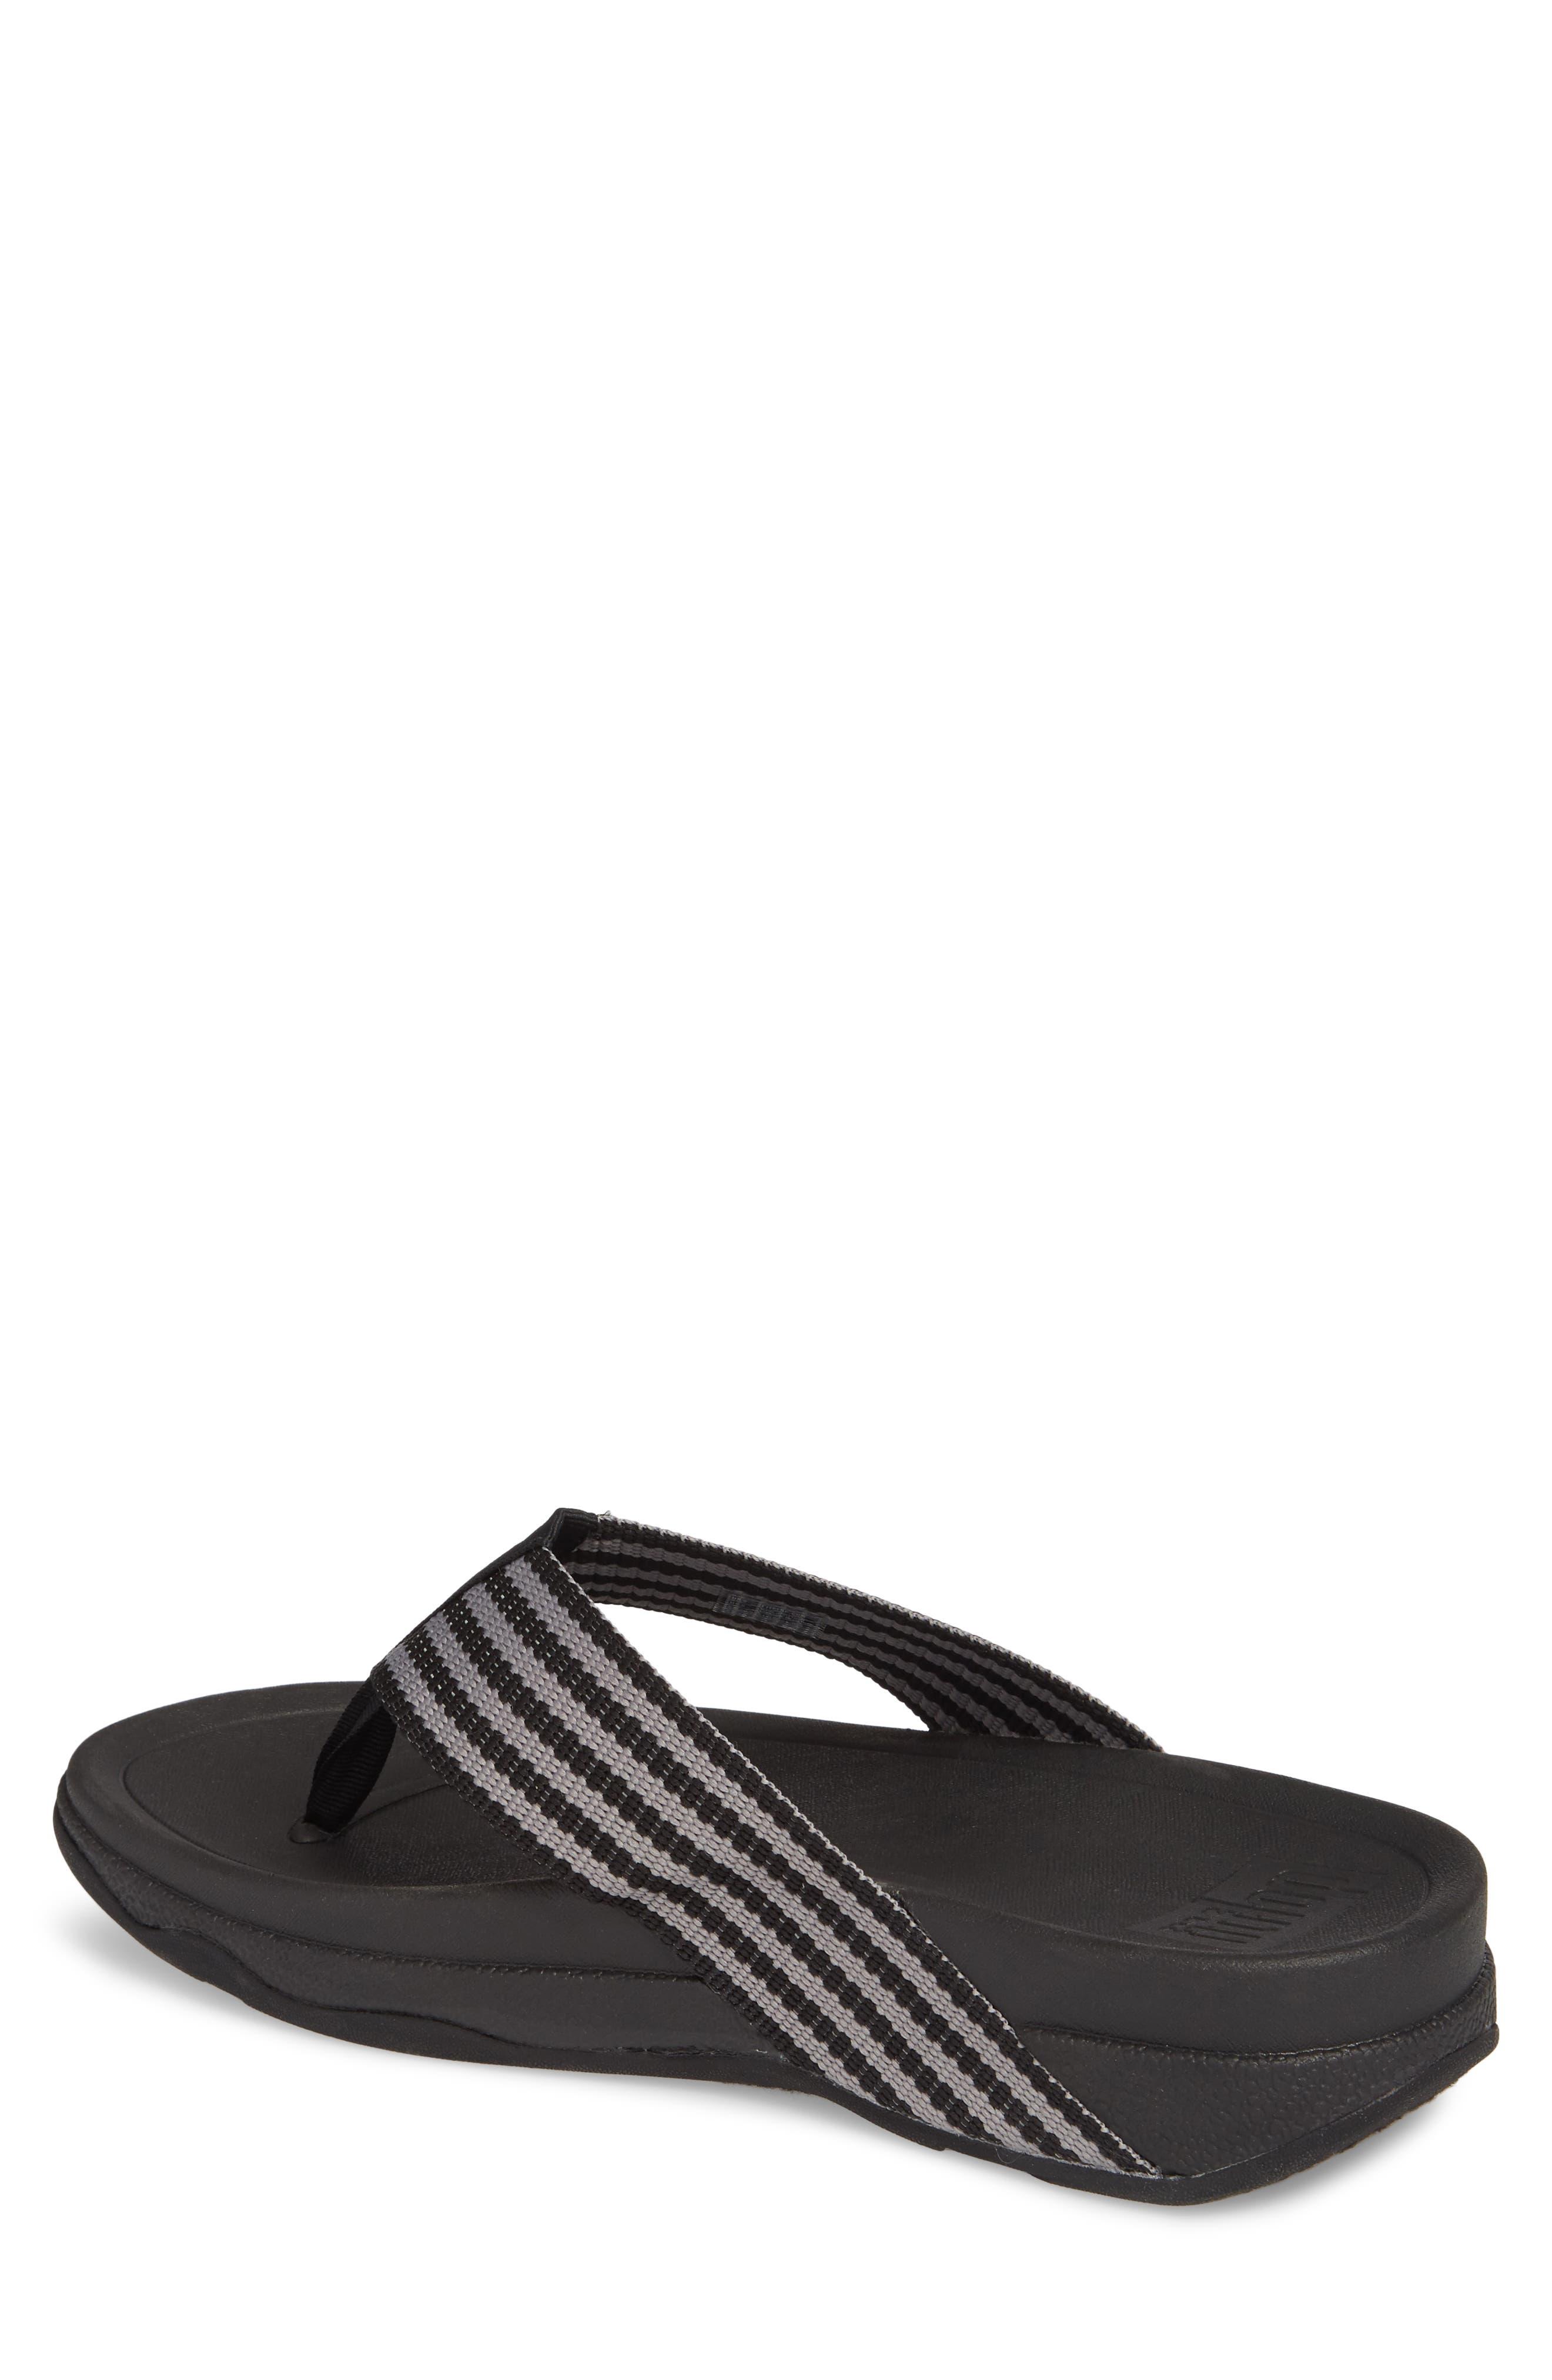 'Surfer' Flip Flop,                             Alternate thumbnail 2, color,                             Black / Grey